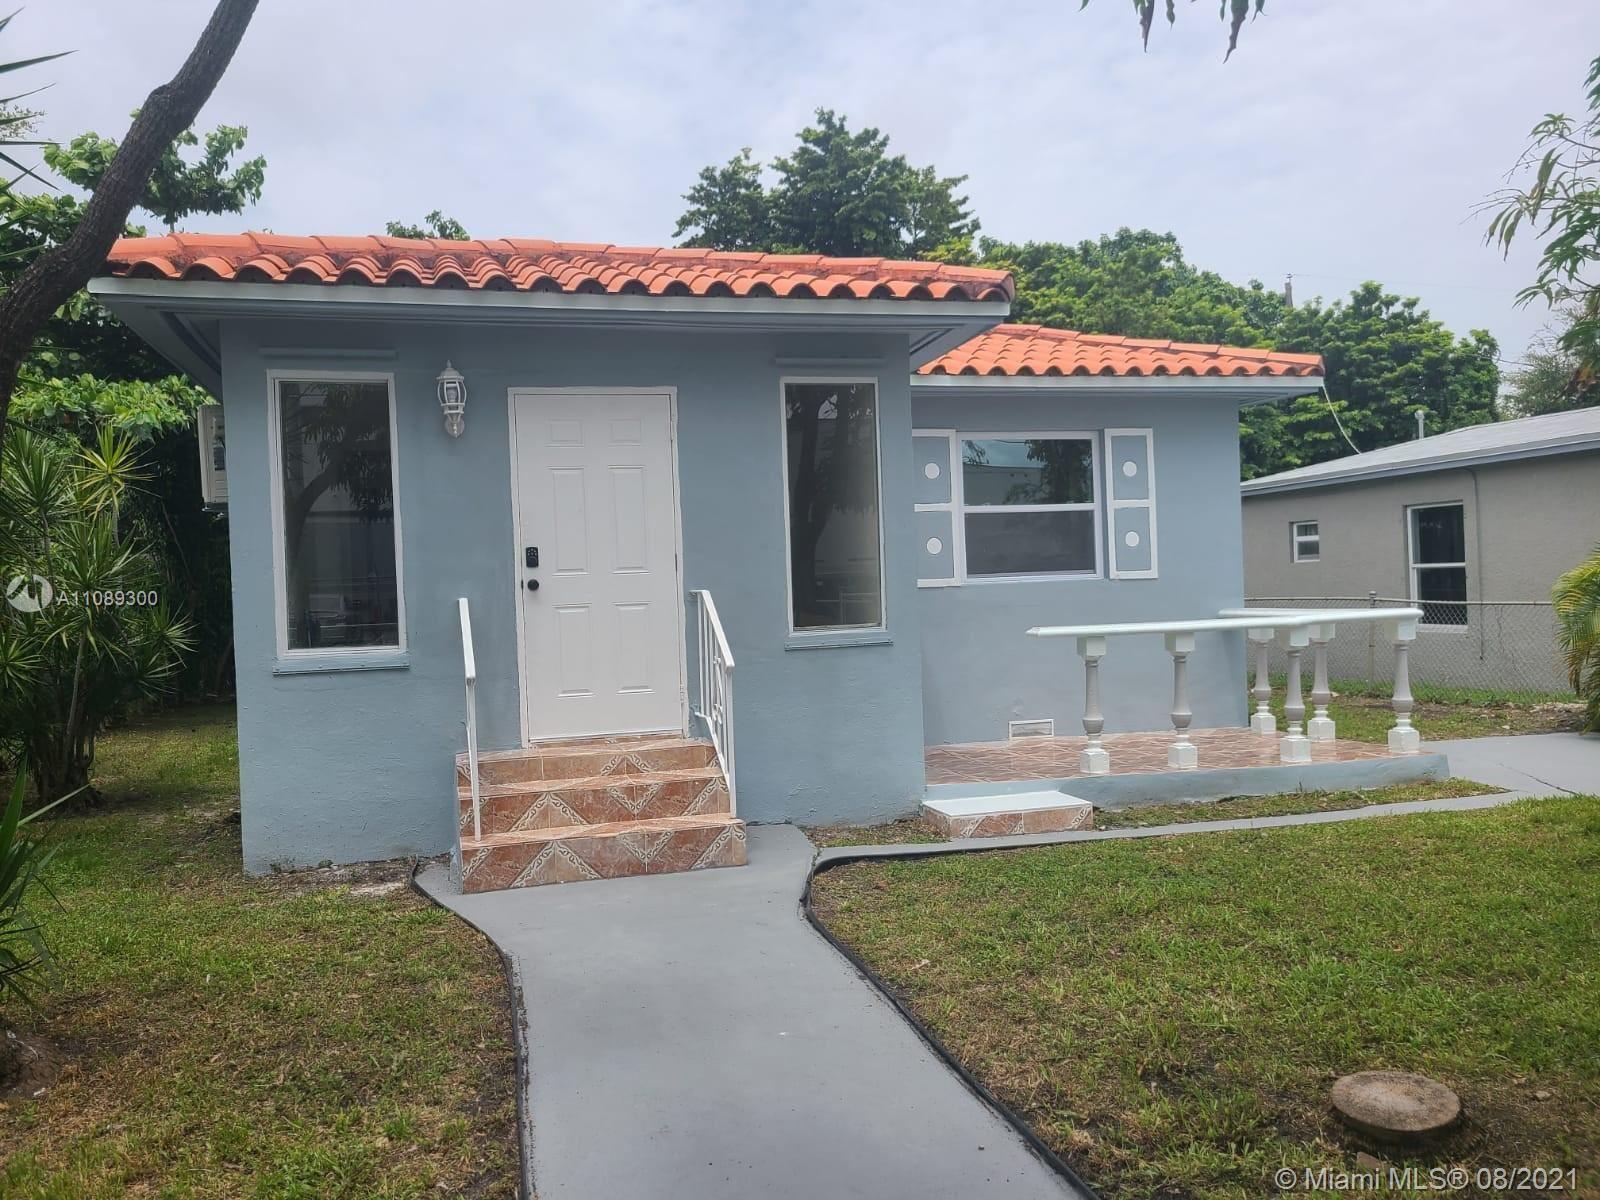 1035 NW 73rd St, Miami, FL 33150 - #: A11089300